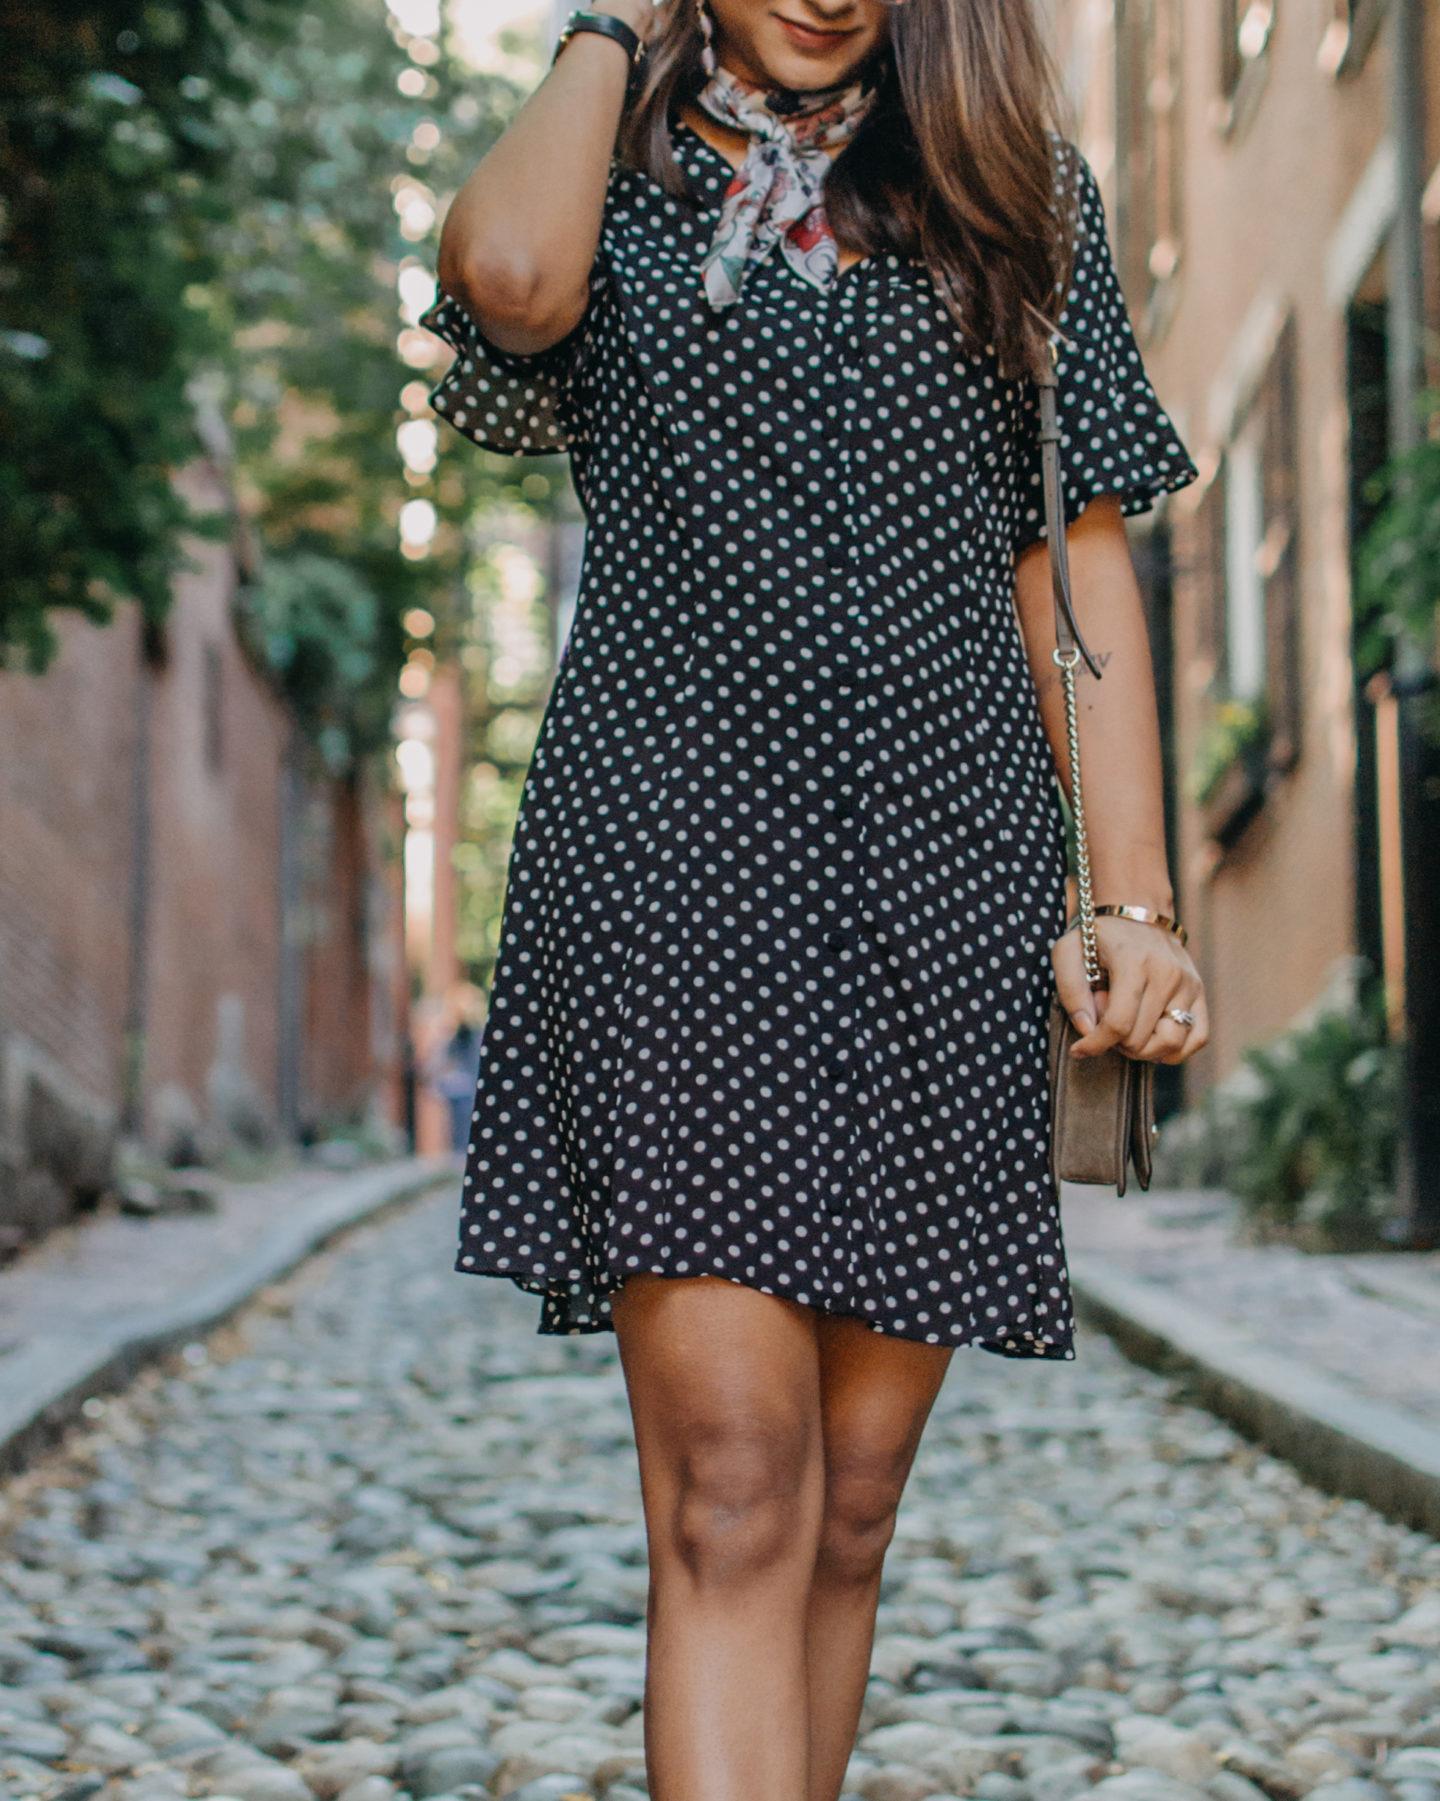 Polka Dots & Pretty Streets